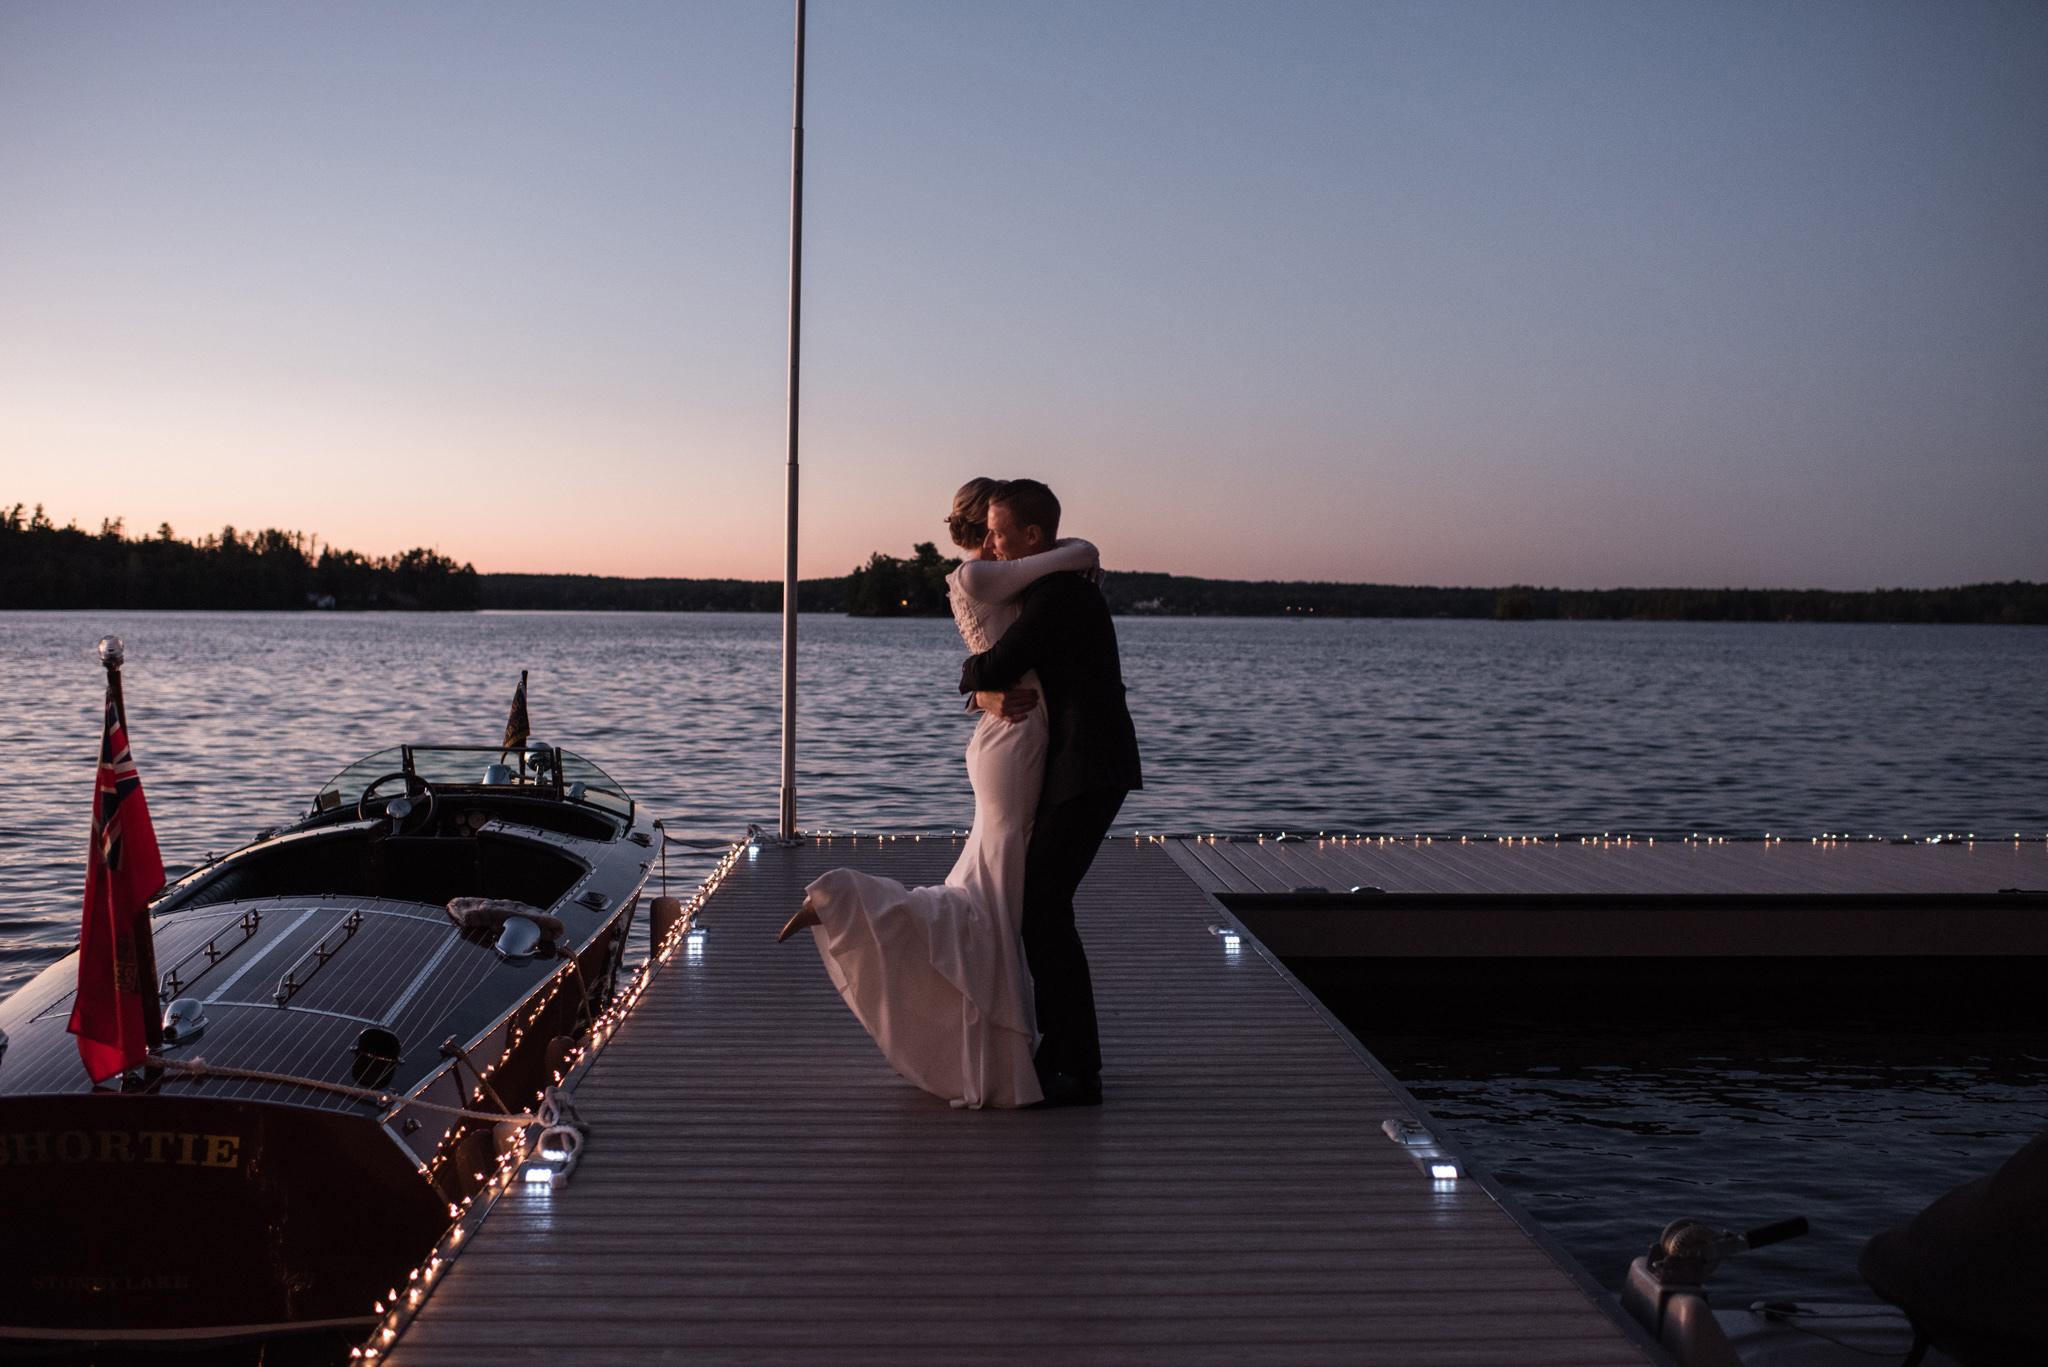 011-string-lights-romantic-wedding-photography-toronto-ontario.jpg